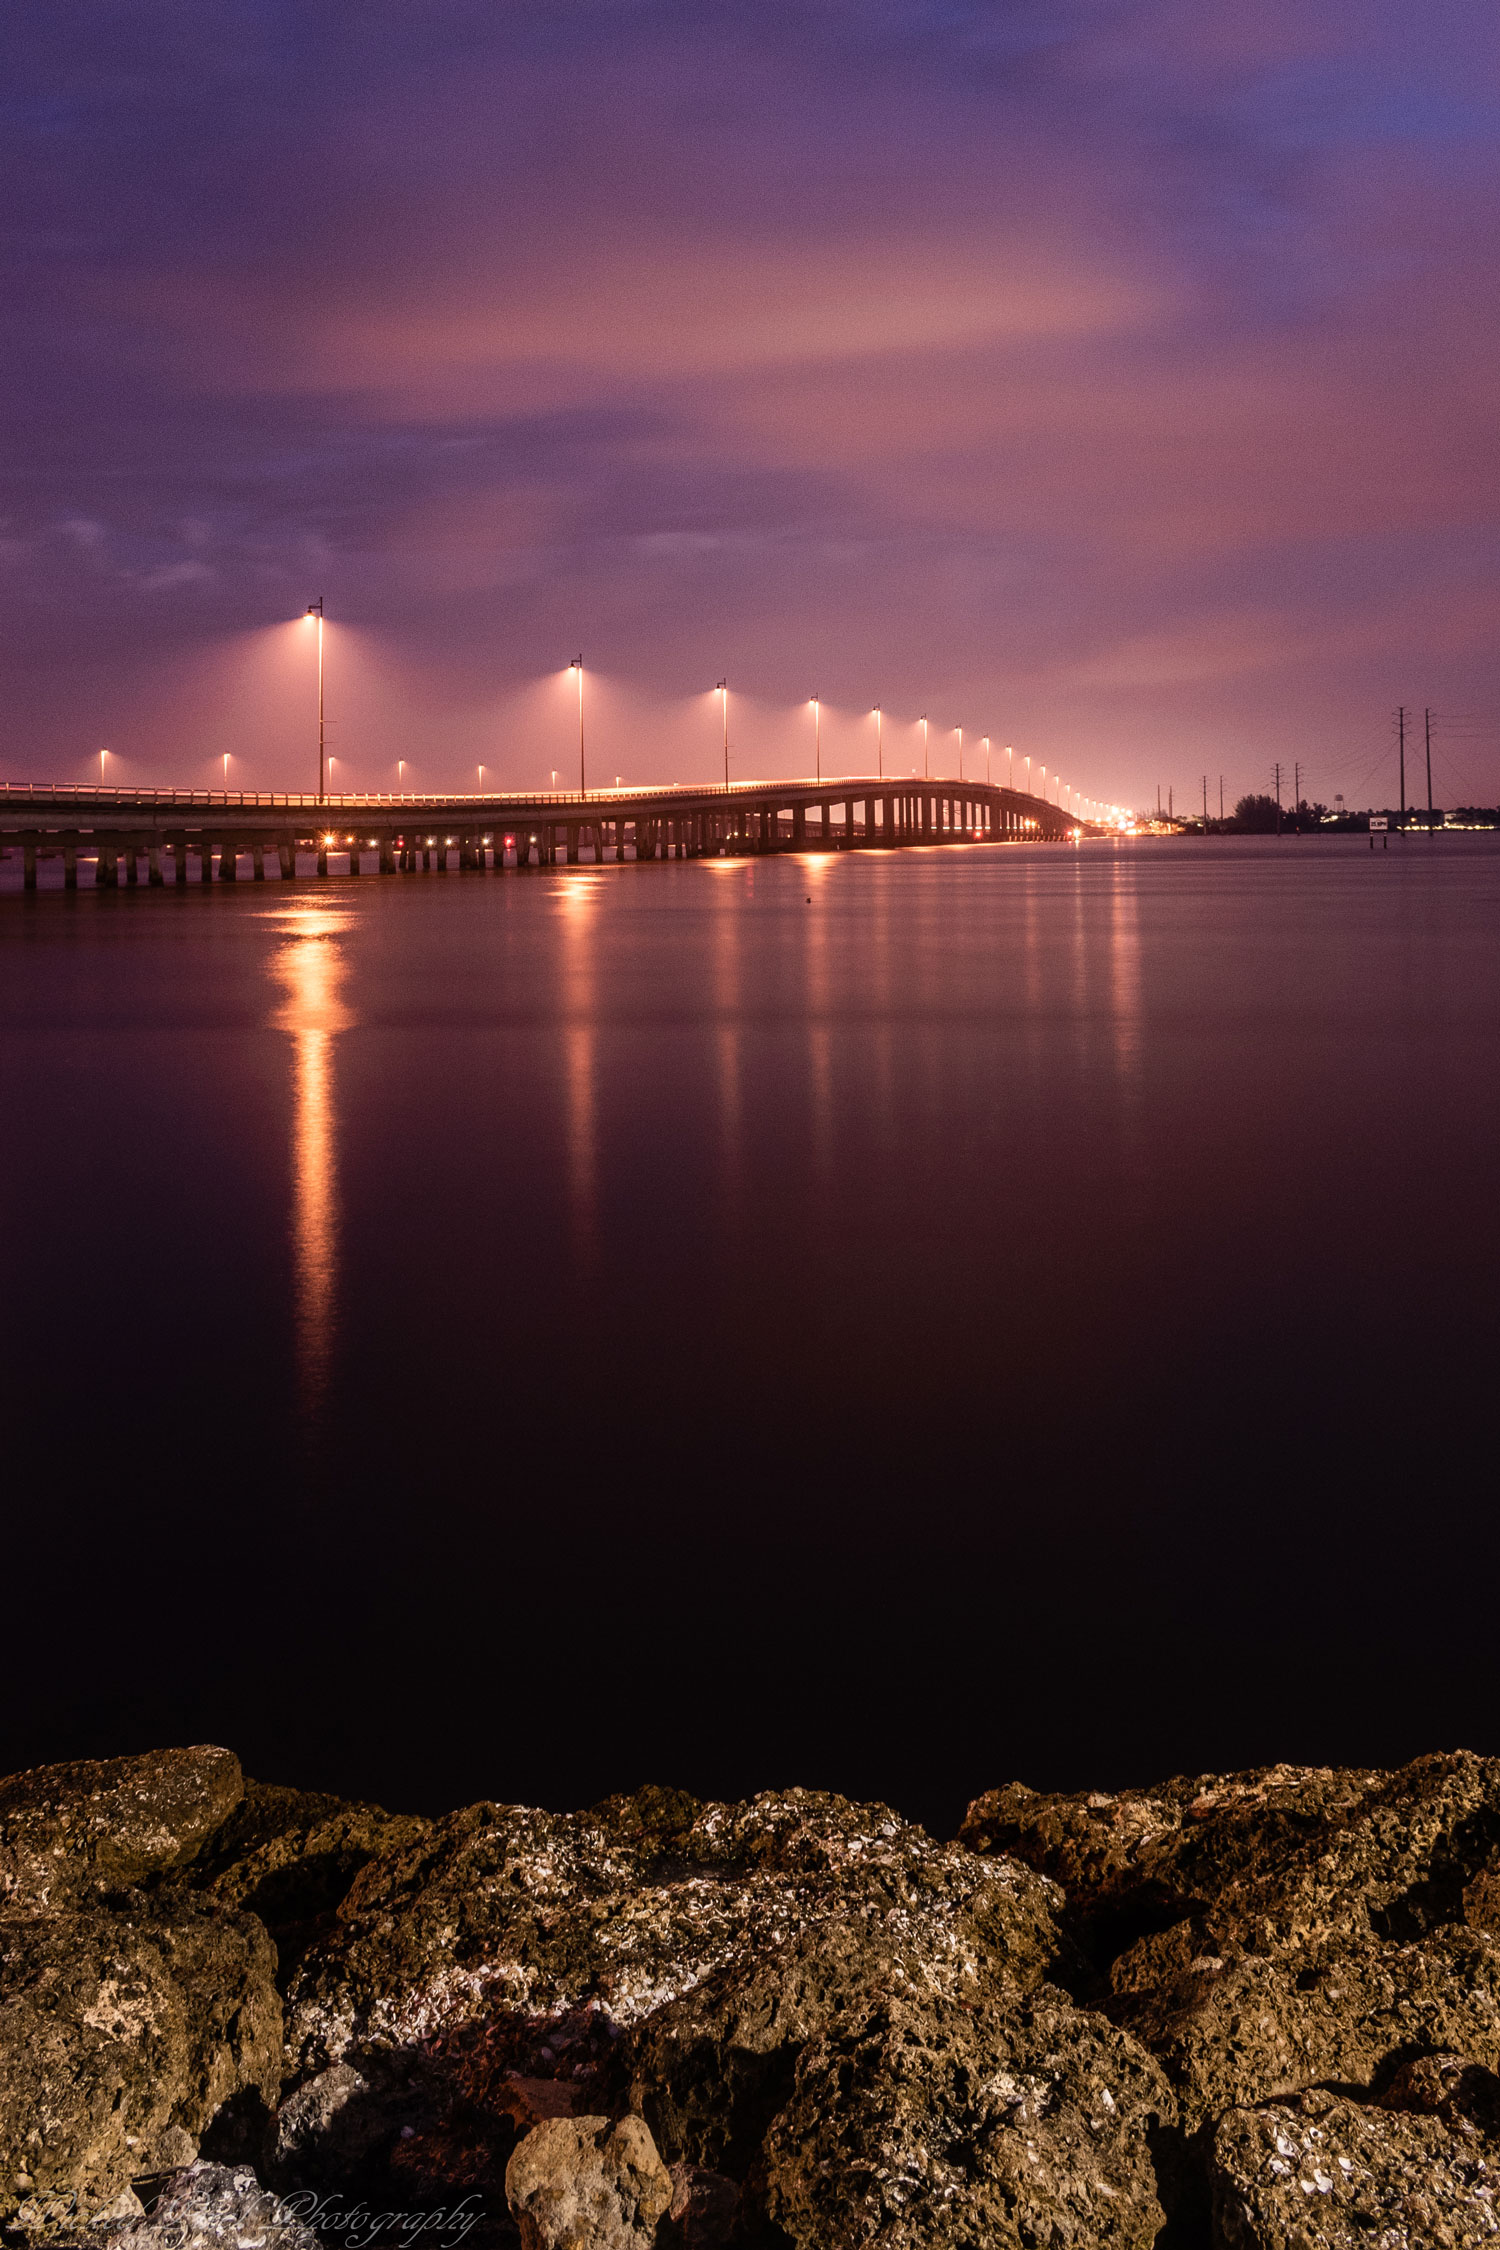 Punta-Gorda-Laishley-Park-Bridge-Long-Exposure-Sunrise.jpg